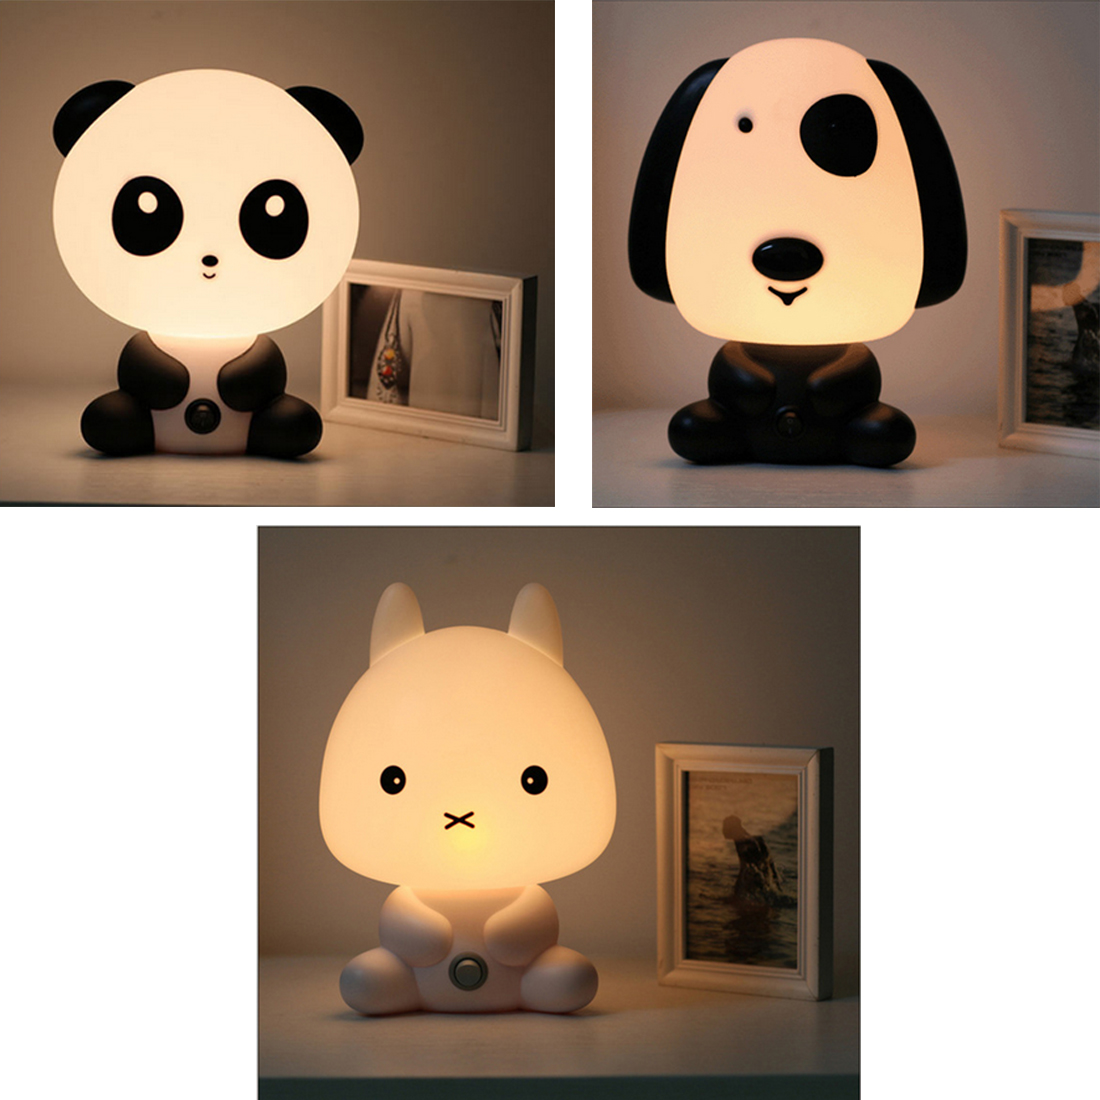 Großzügig Pvc Lampe Draht 22 Awg 2 Kond Galerie - Elektrische ...